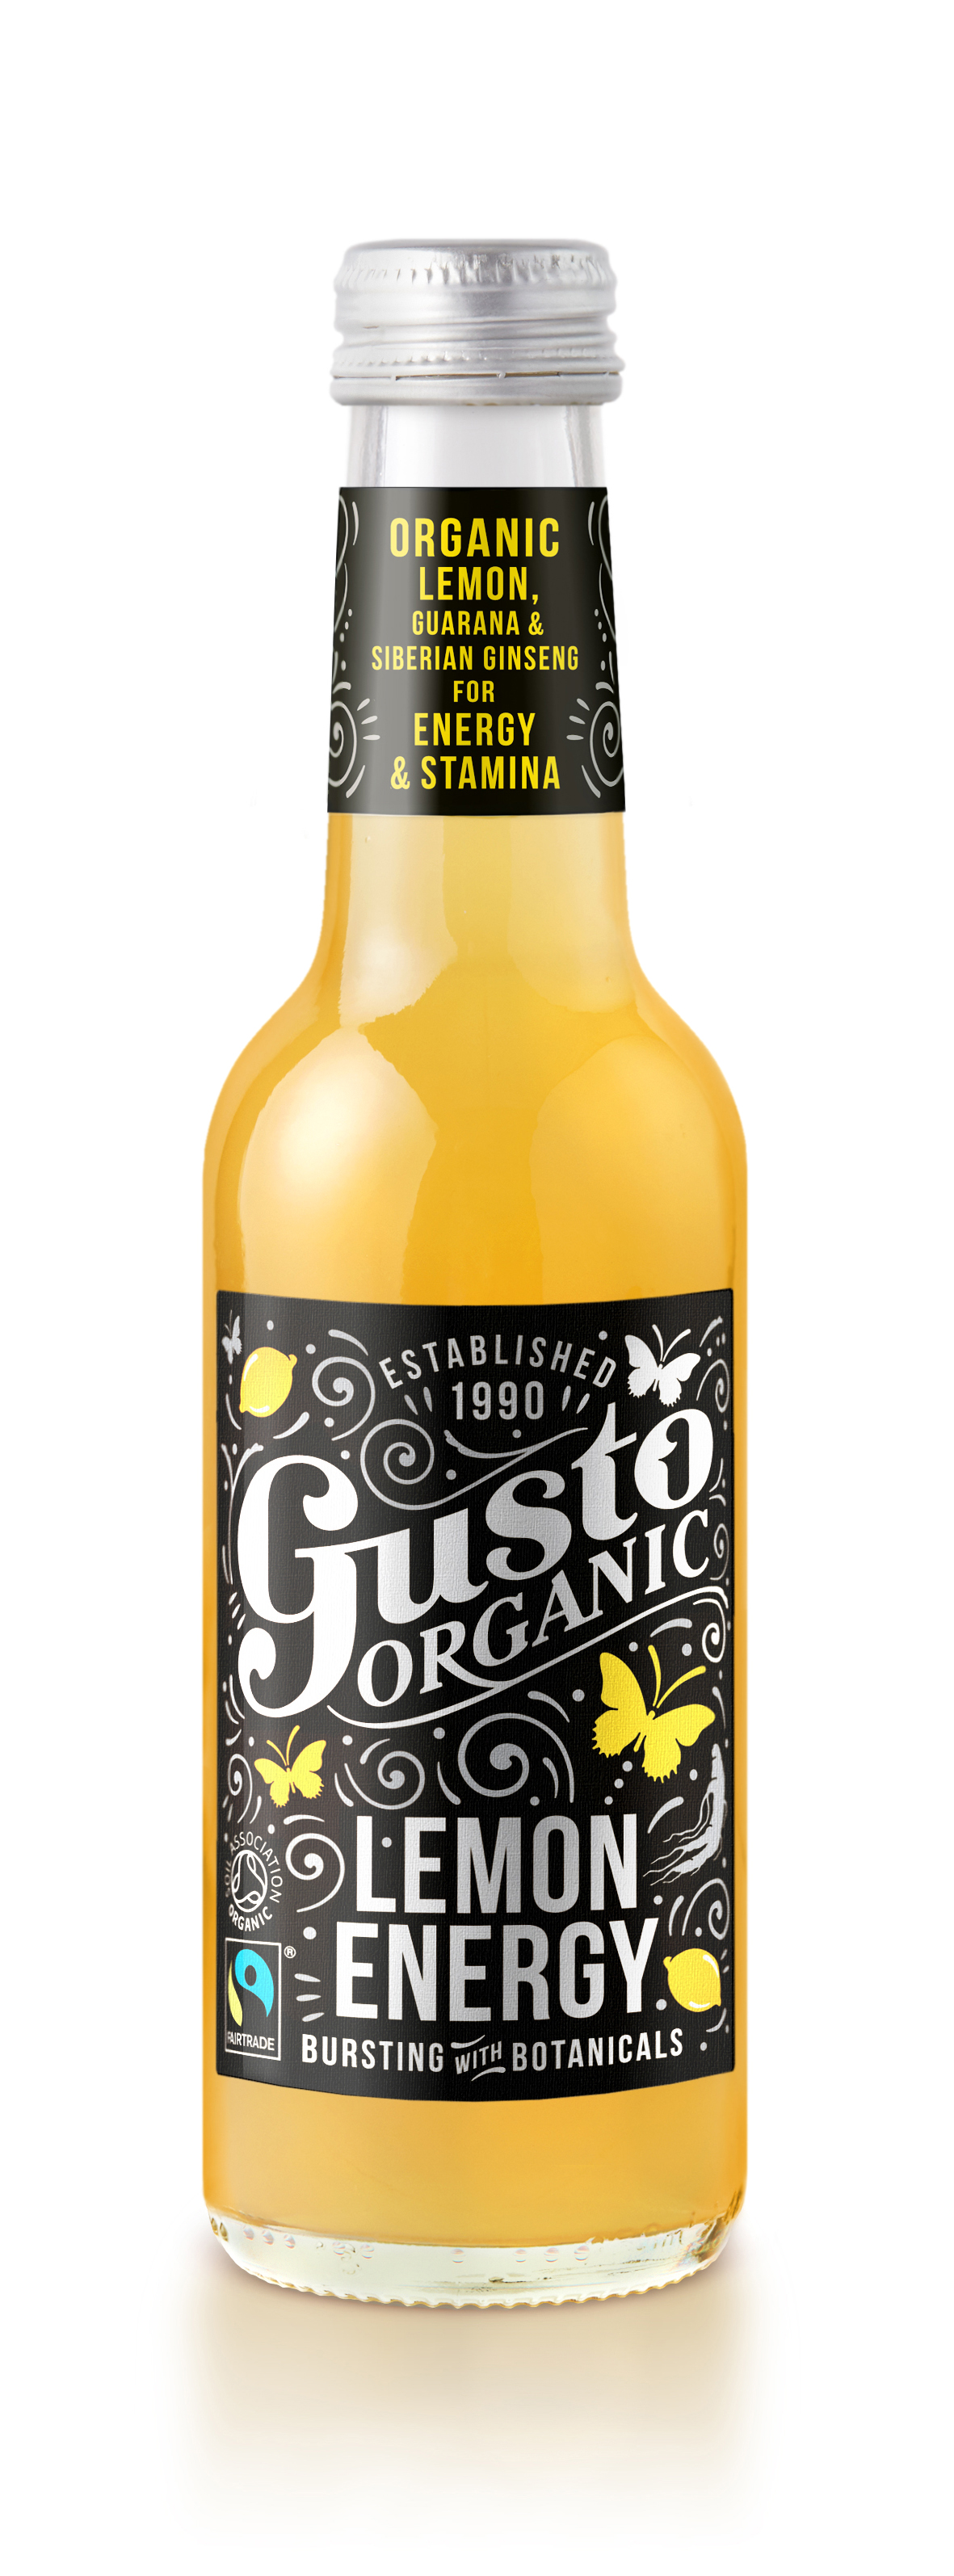 Lemon Energy - Gusto